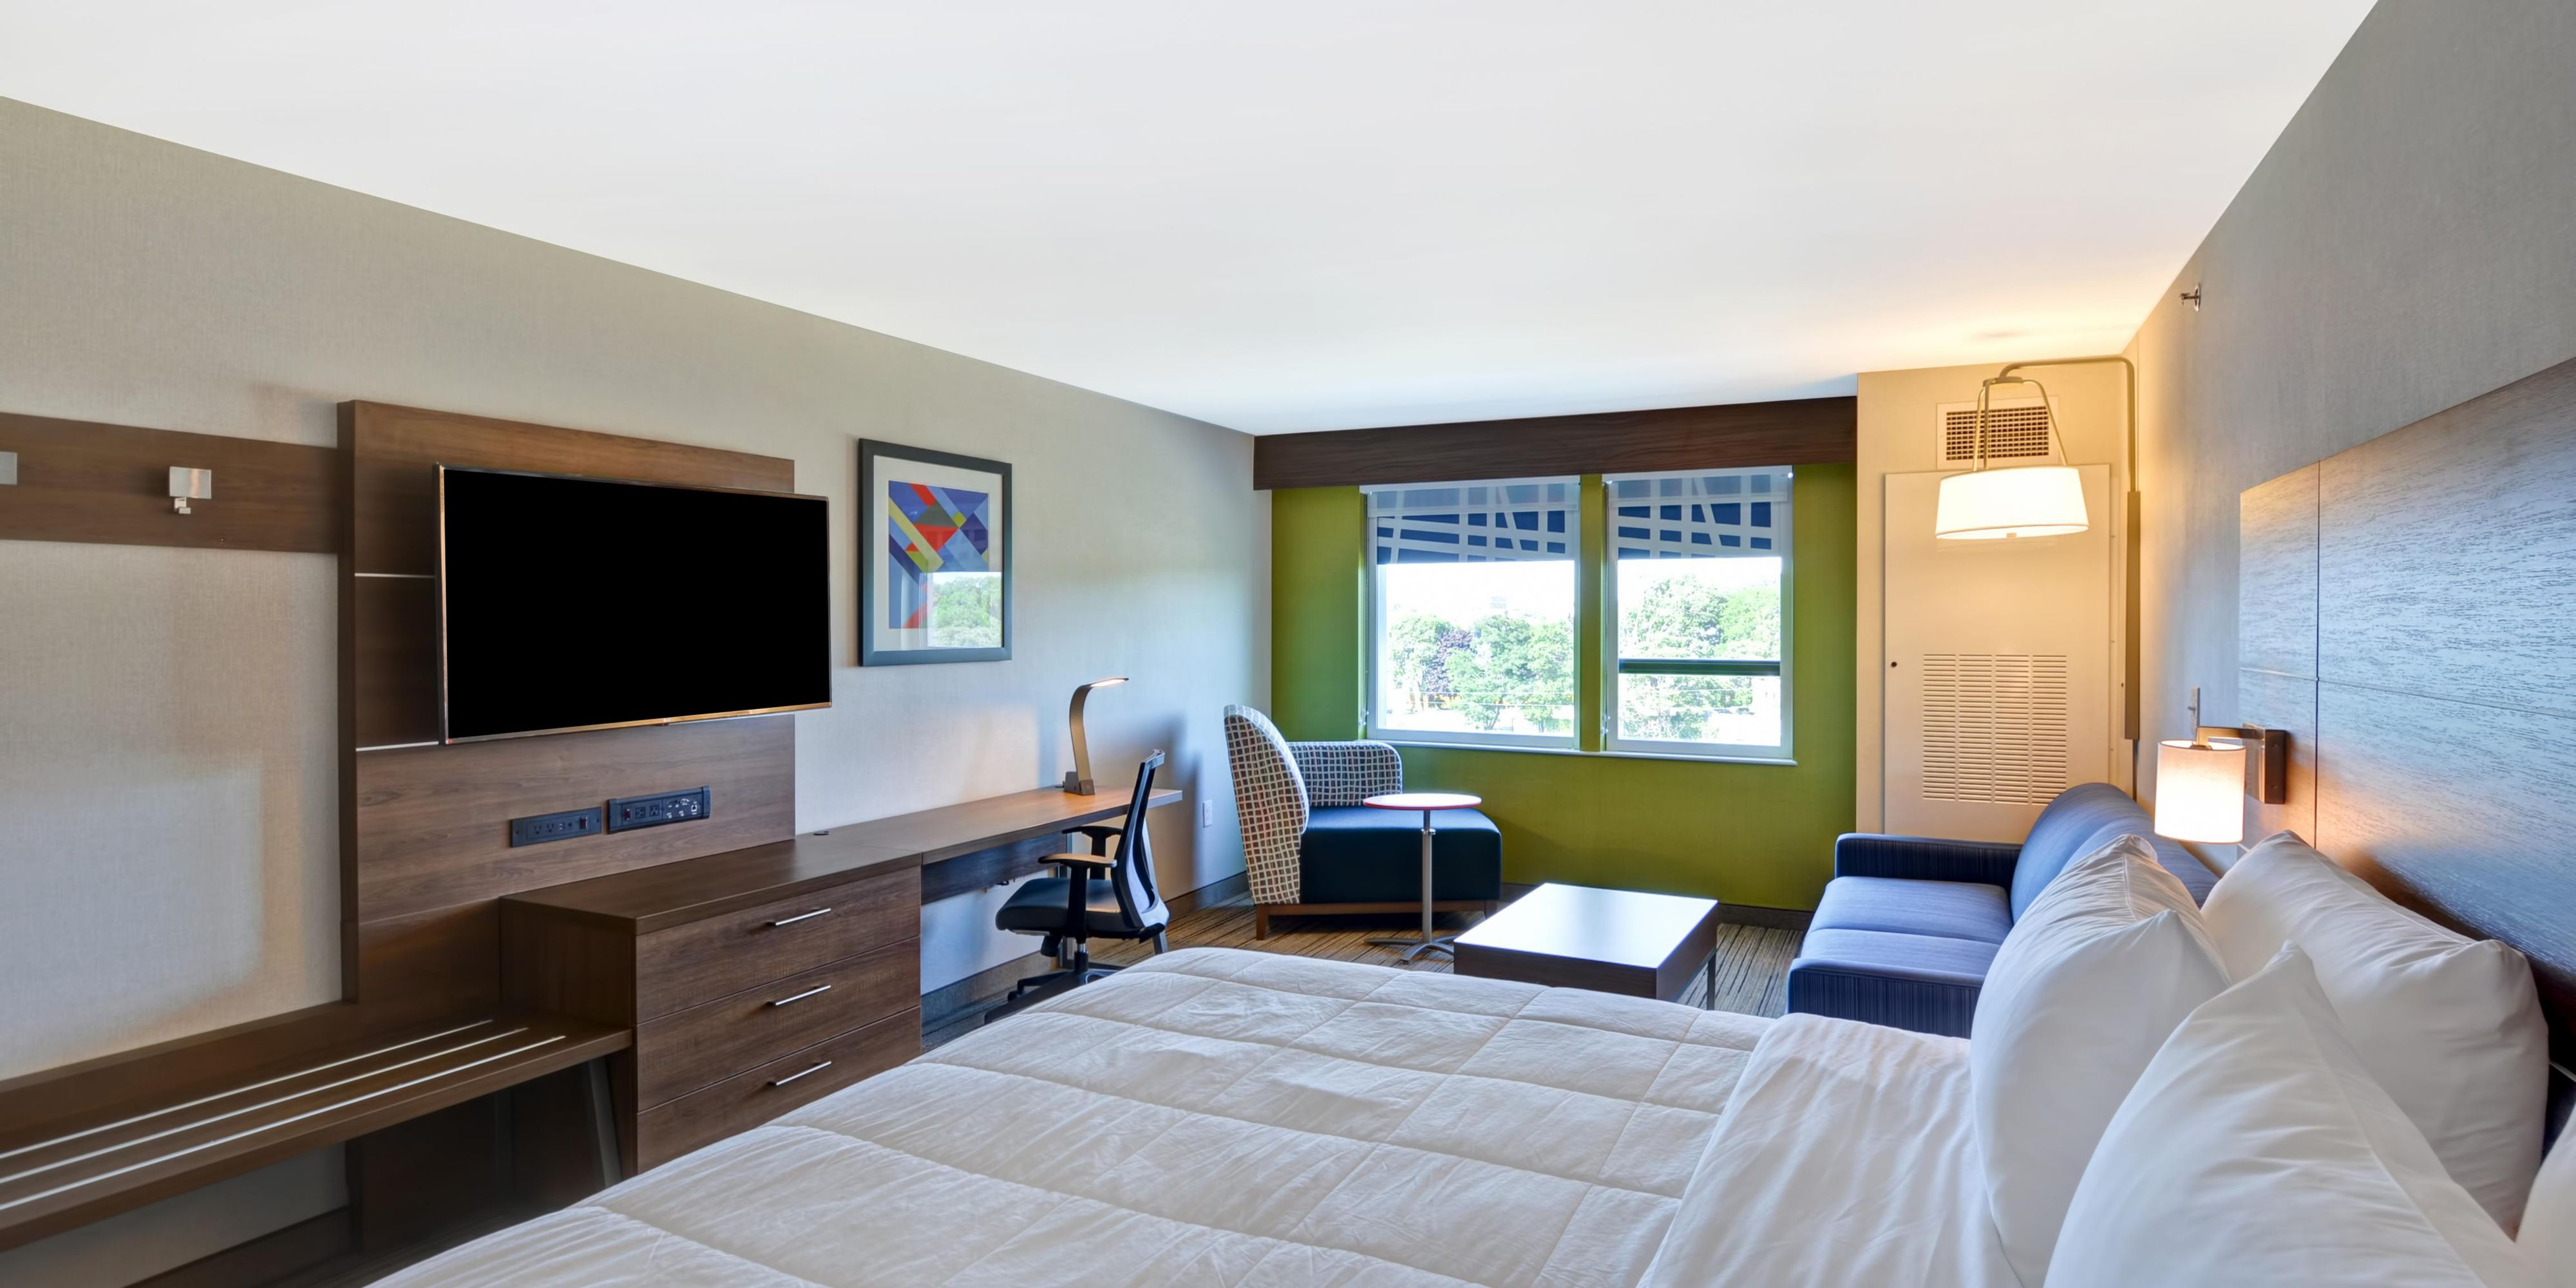 Hotels Near Boston Convention Center In South Boston